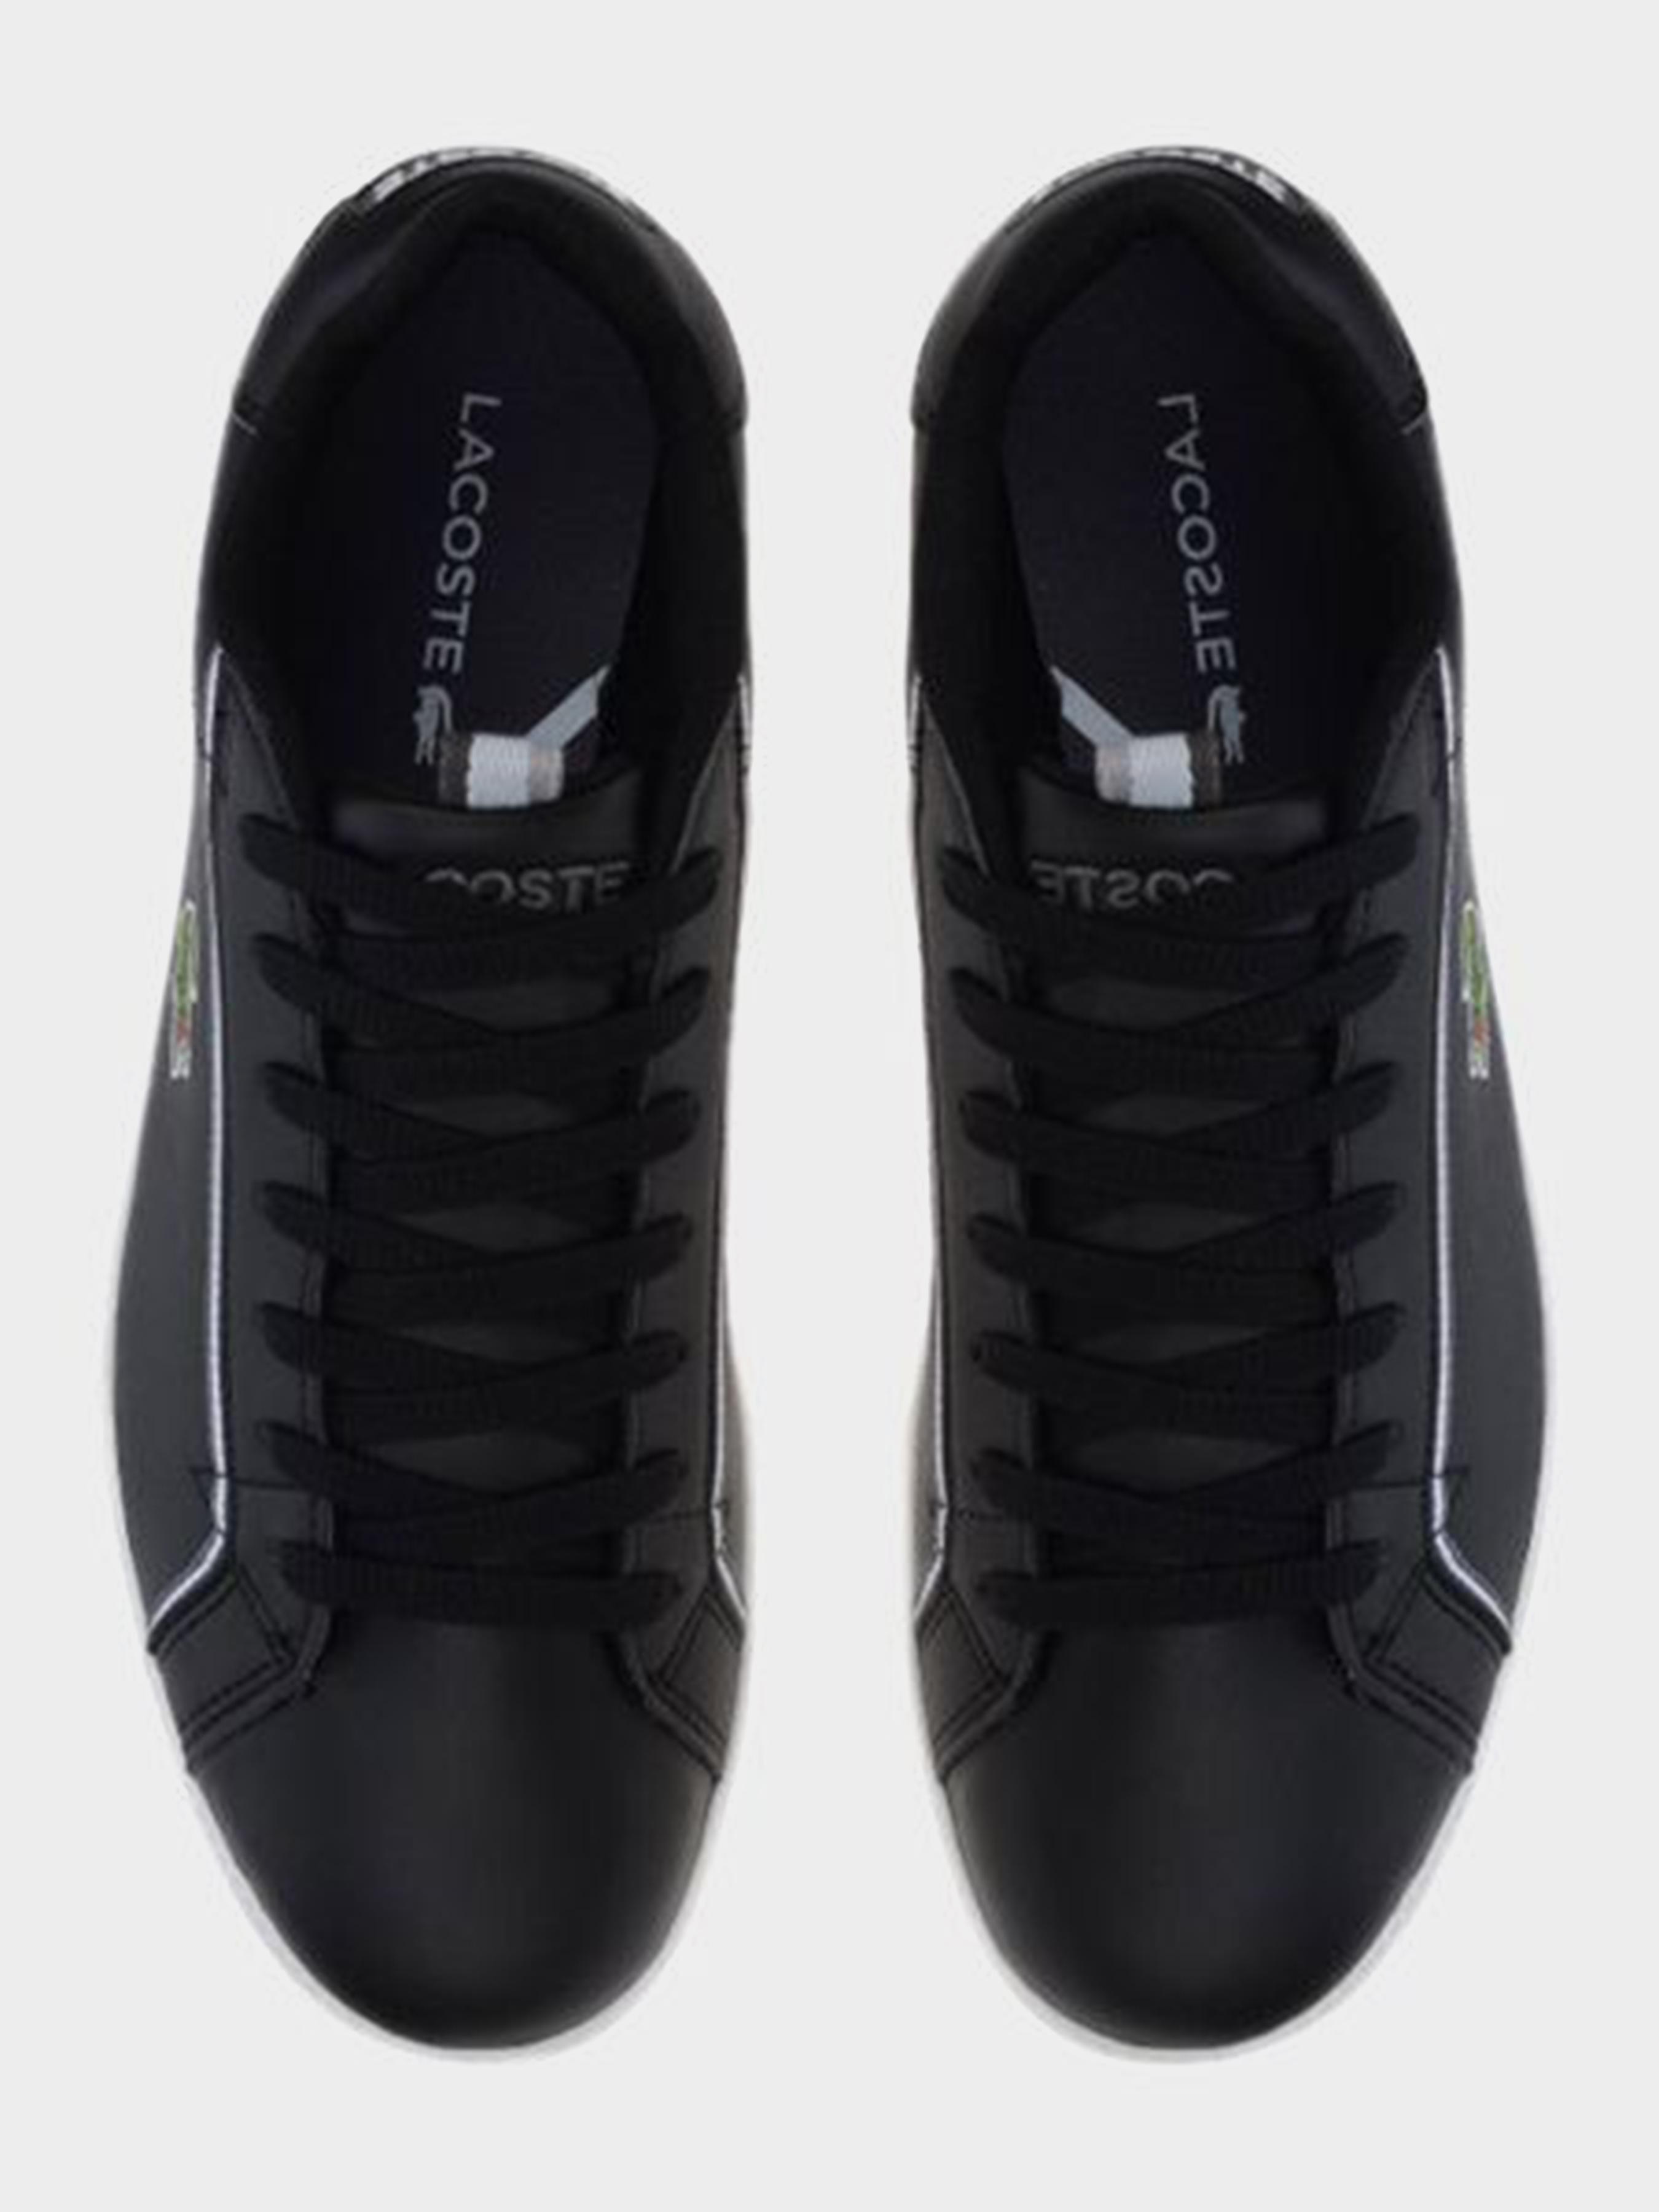 Полуботинки для мужчин Lacoste LK185 купить обувь, 2017